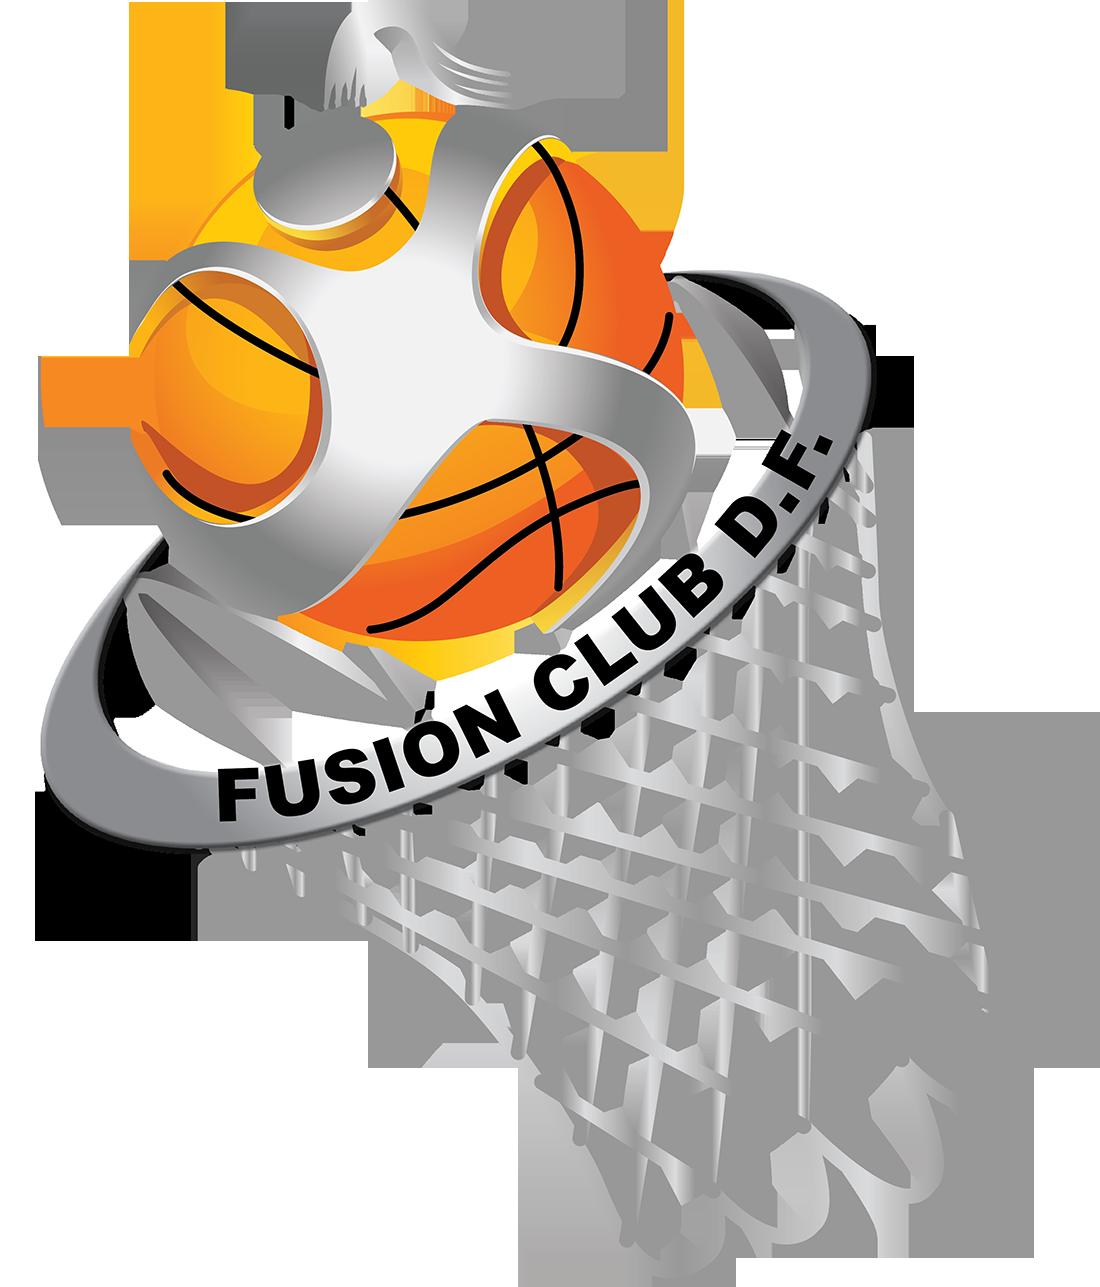 Fusion Club D.F curvas lnbp femenino en viva basquet